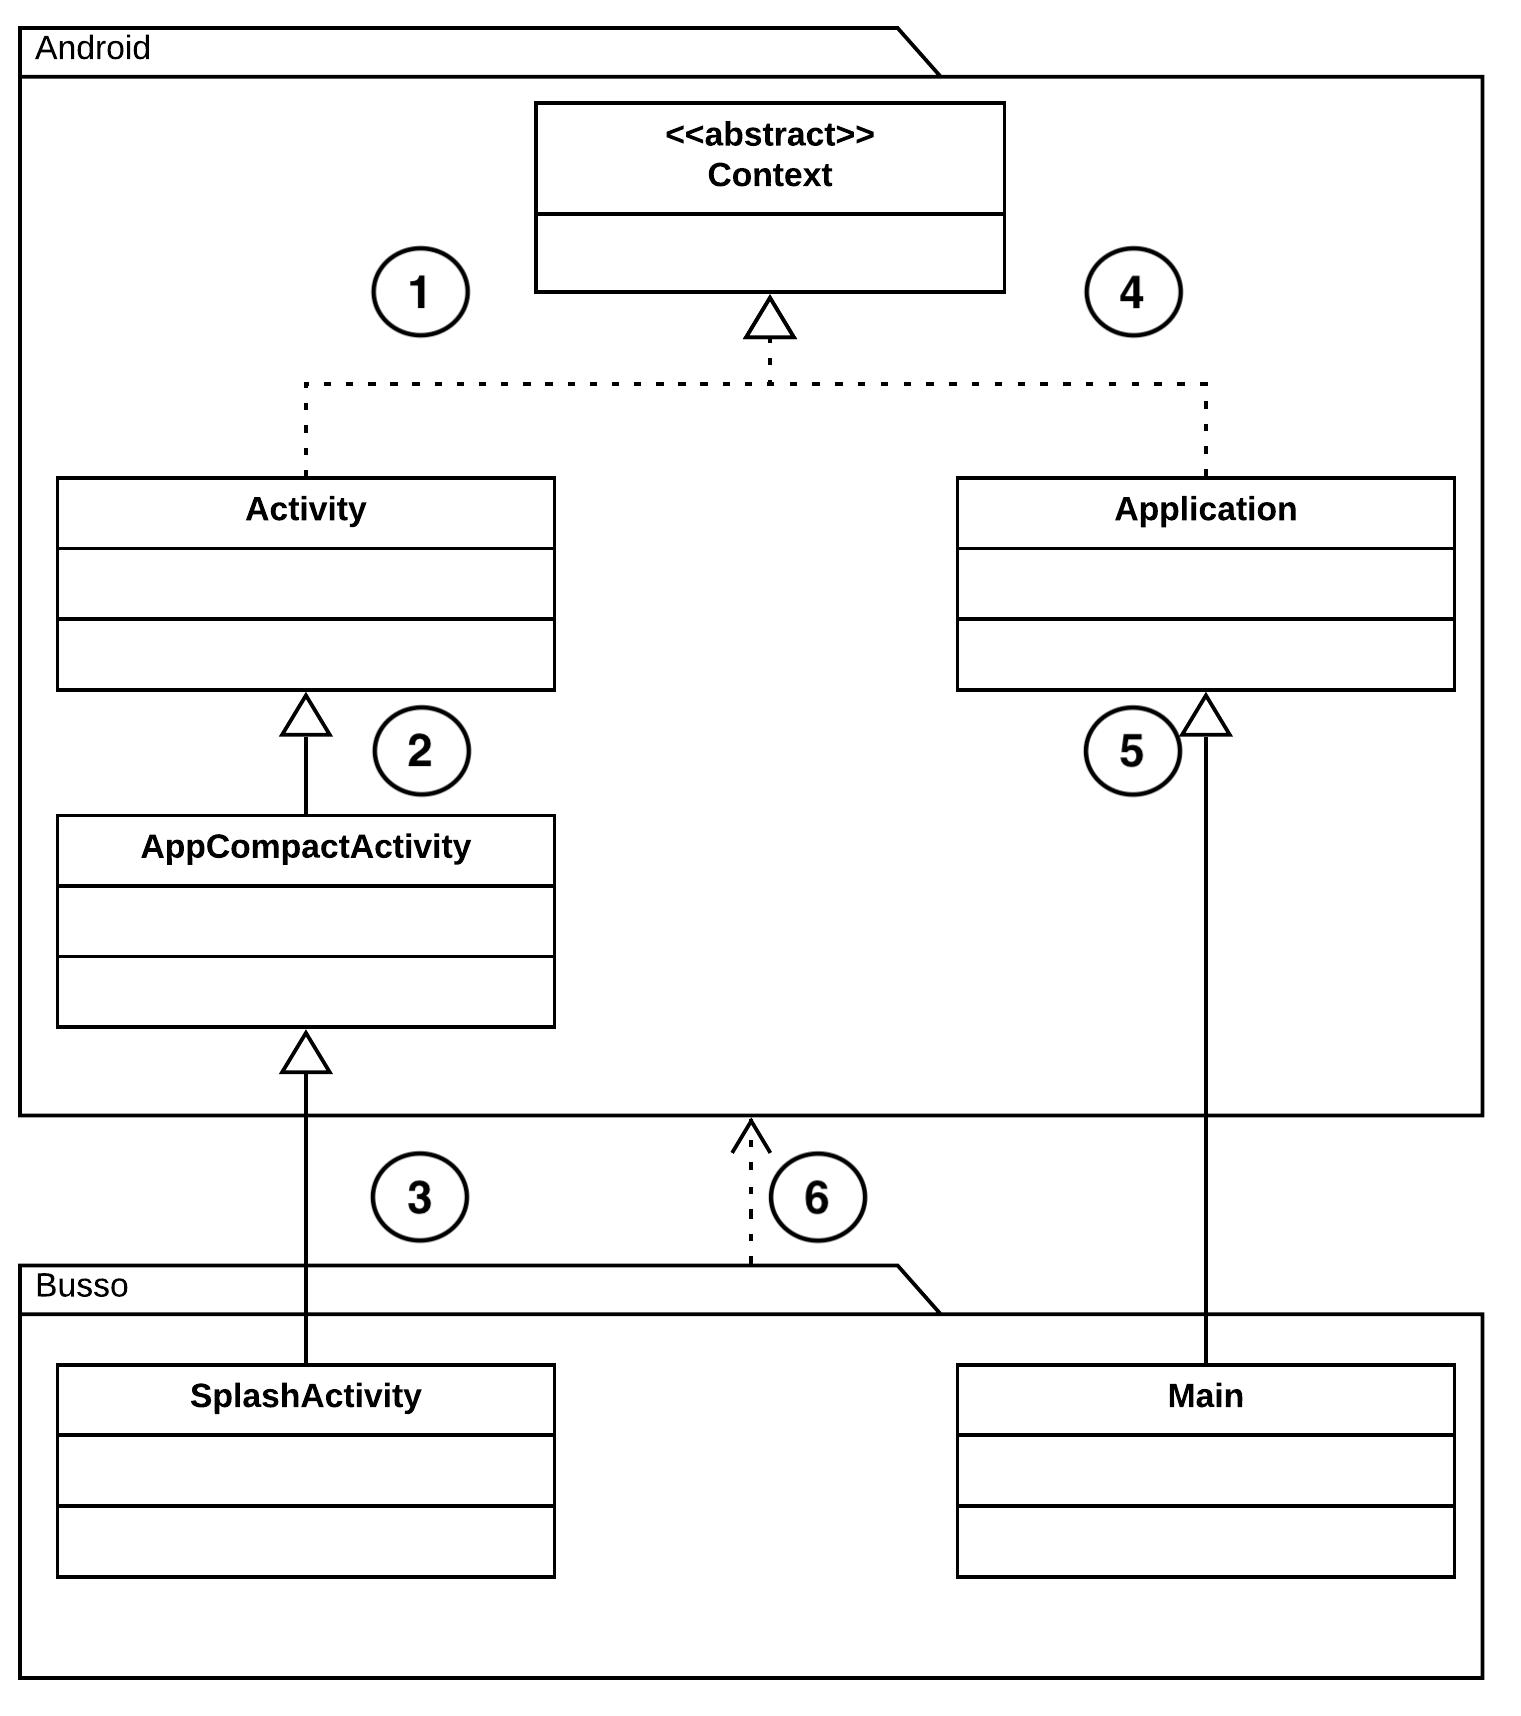 Figure 4.2 — Class Diagram for the Main and SplashActivity classes